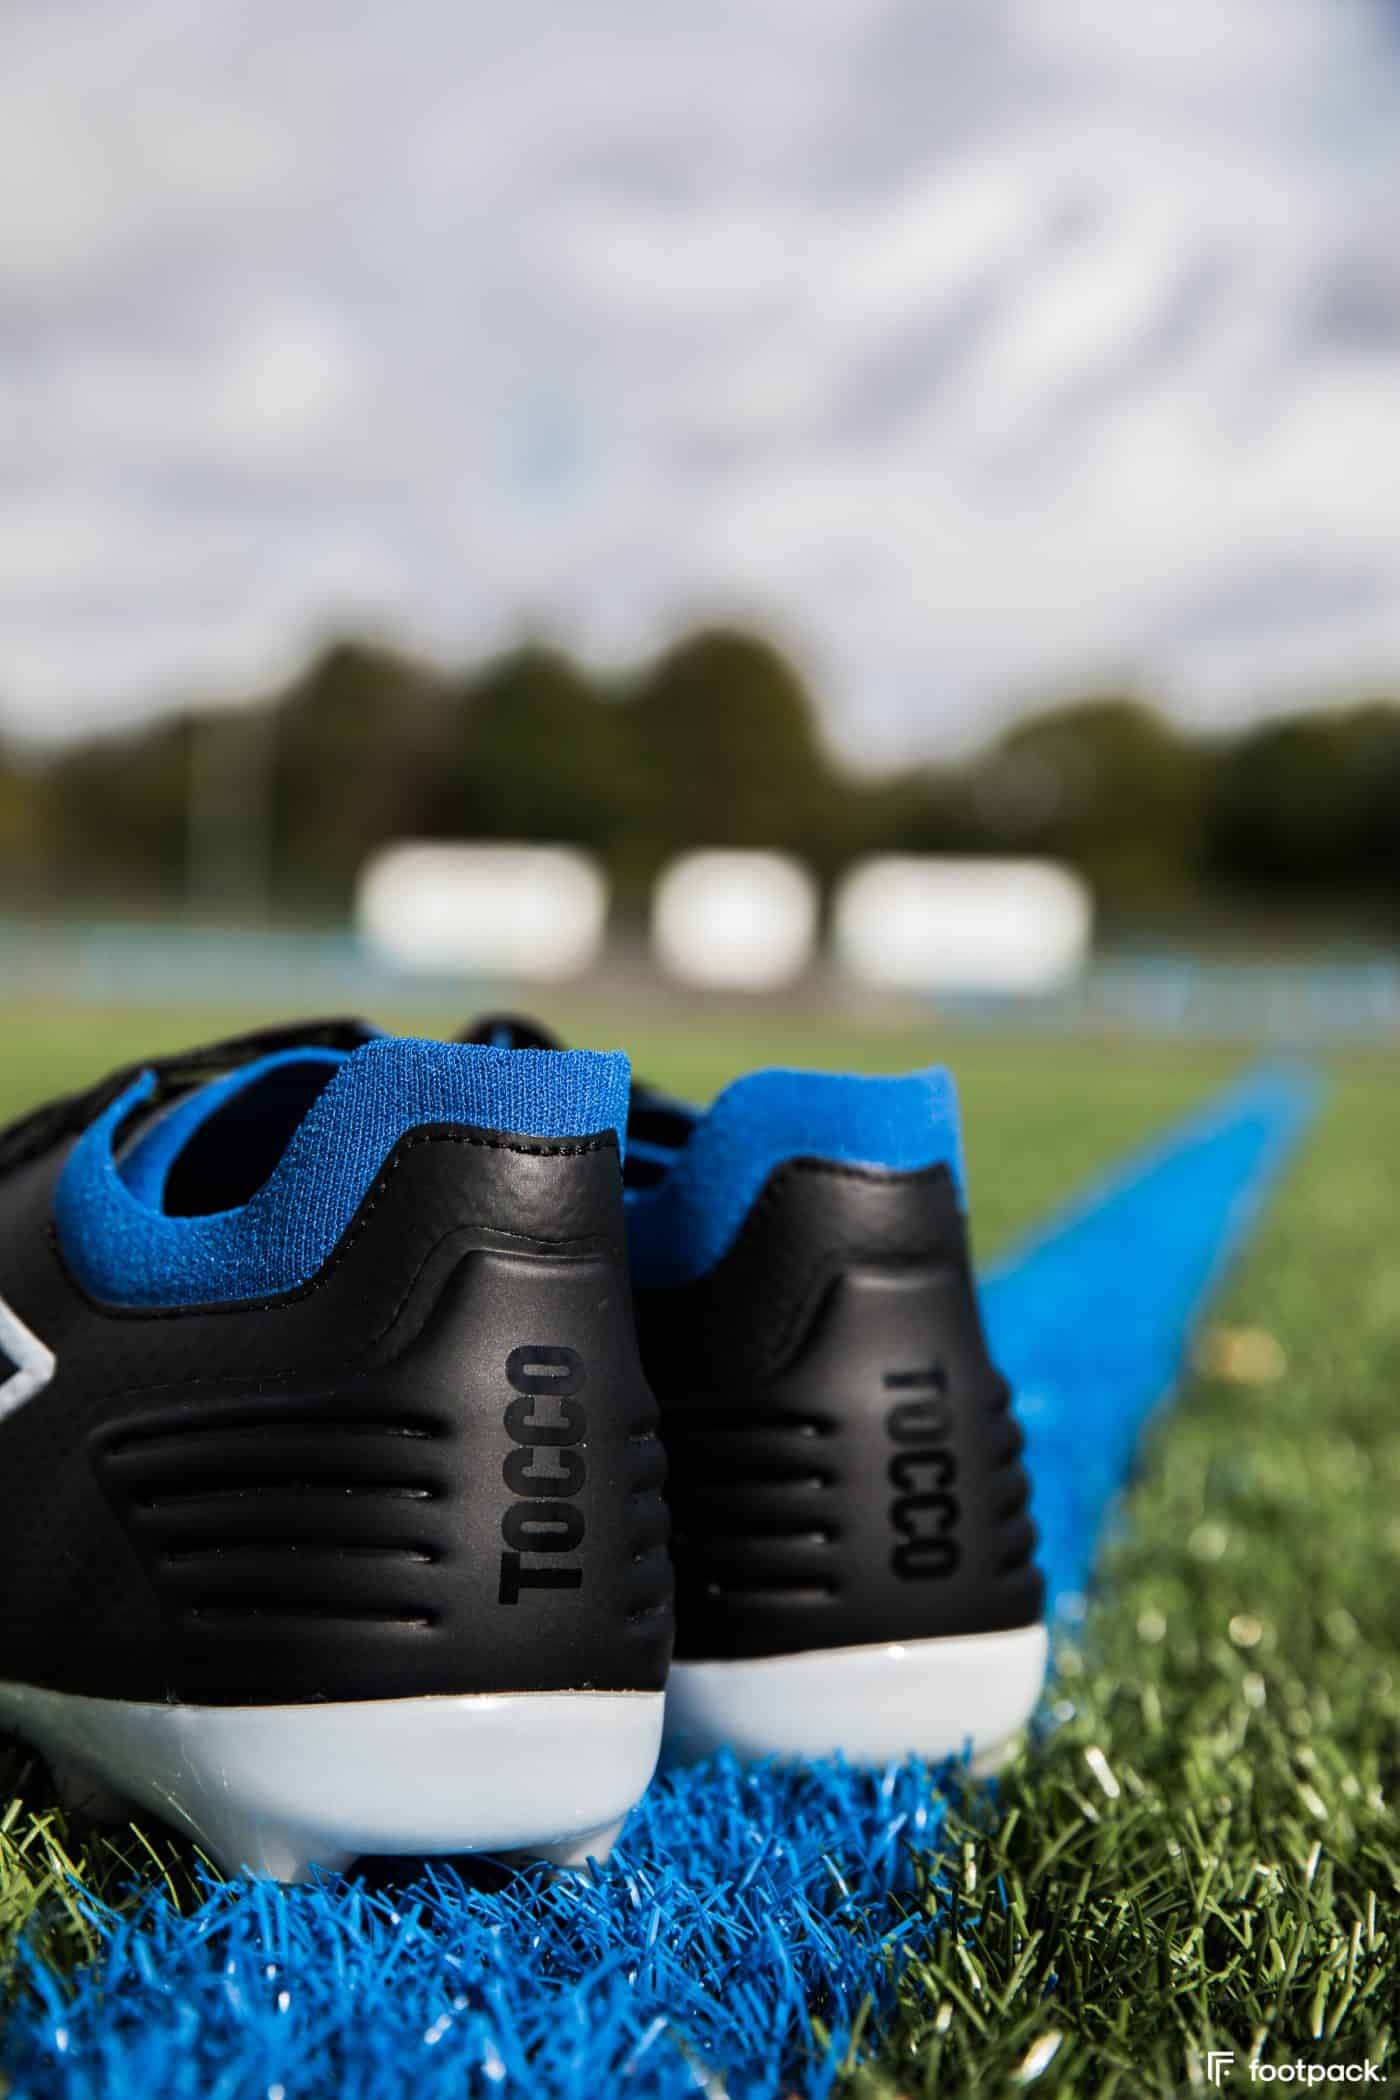 umbro-tocco-noir-bleu-2020-footpack-8